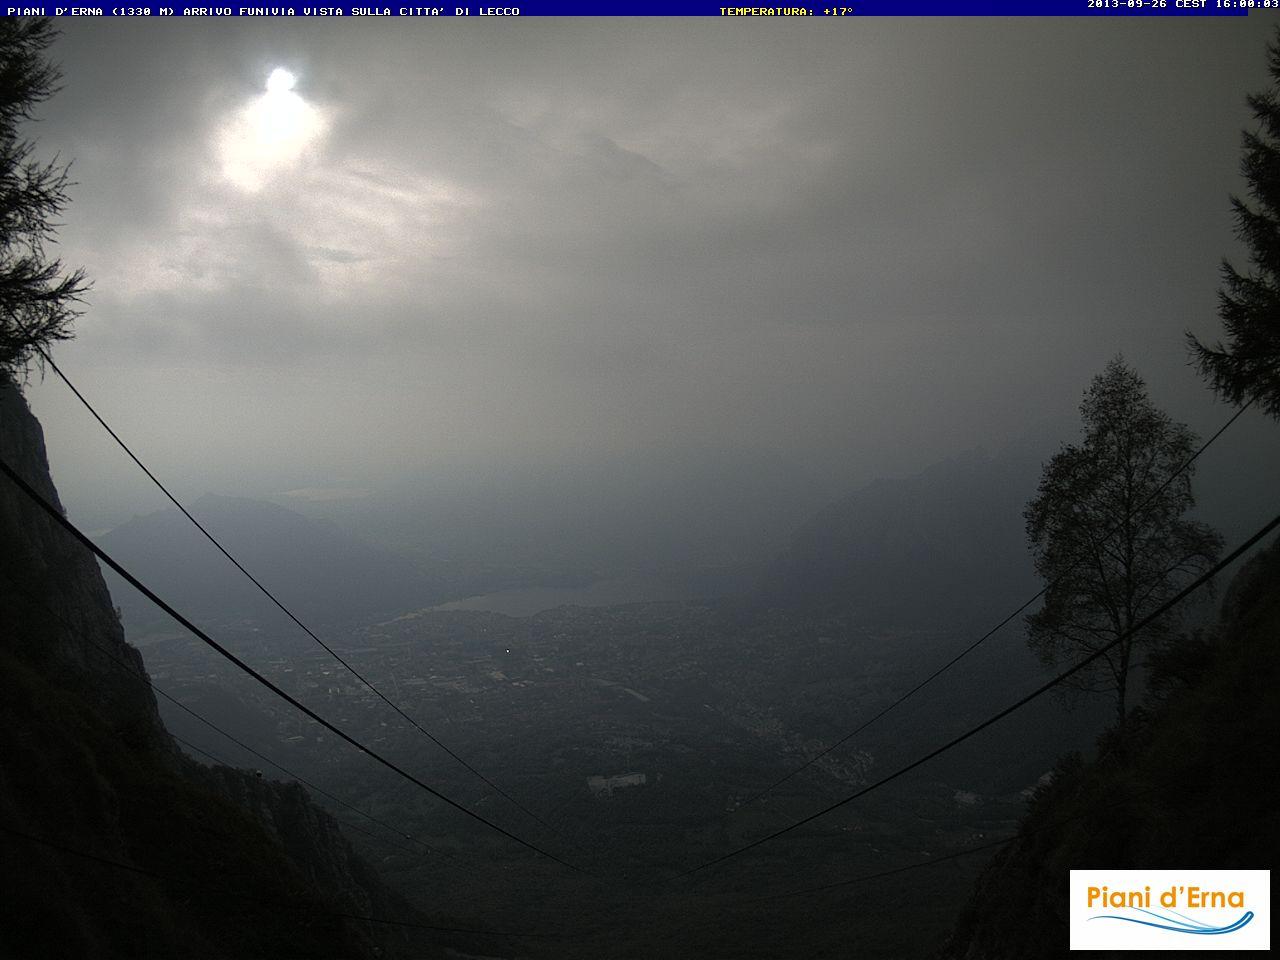 Webcam Monte Resegone 1330 - Bergamo